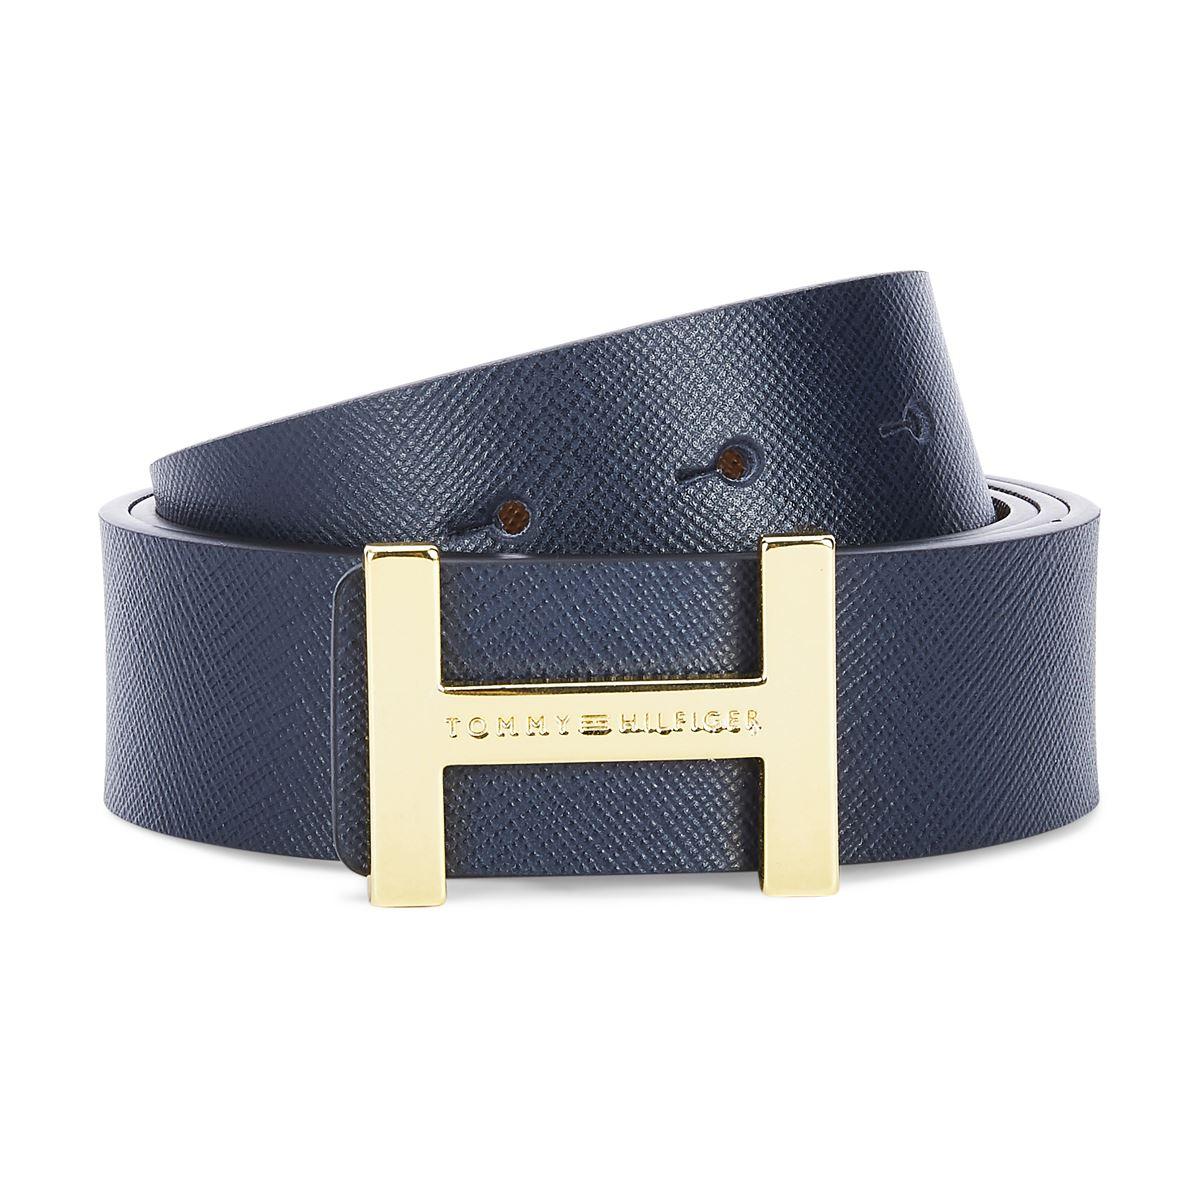 Tommy Hilfiger Leather Mens Textured Navy + Tan Decent Reversible Belt